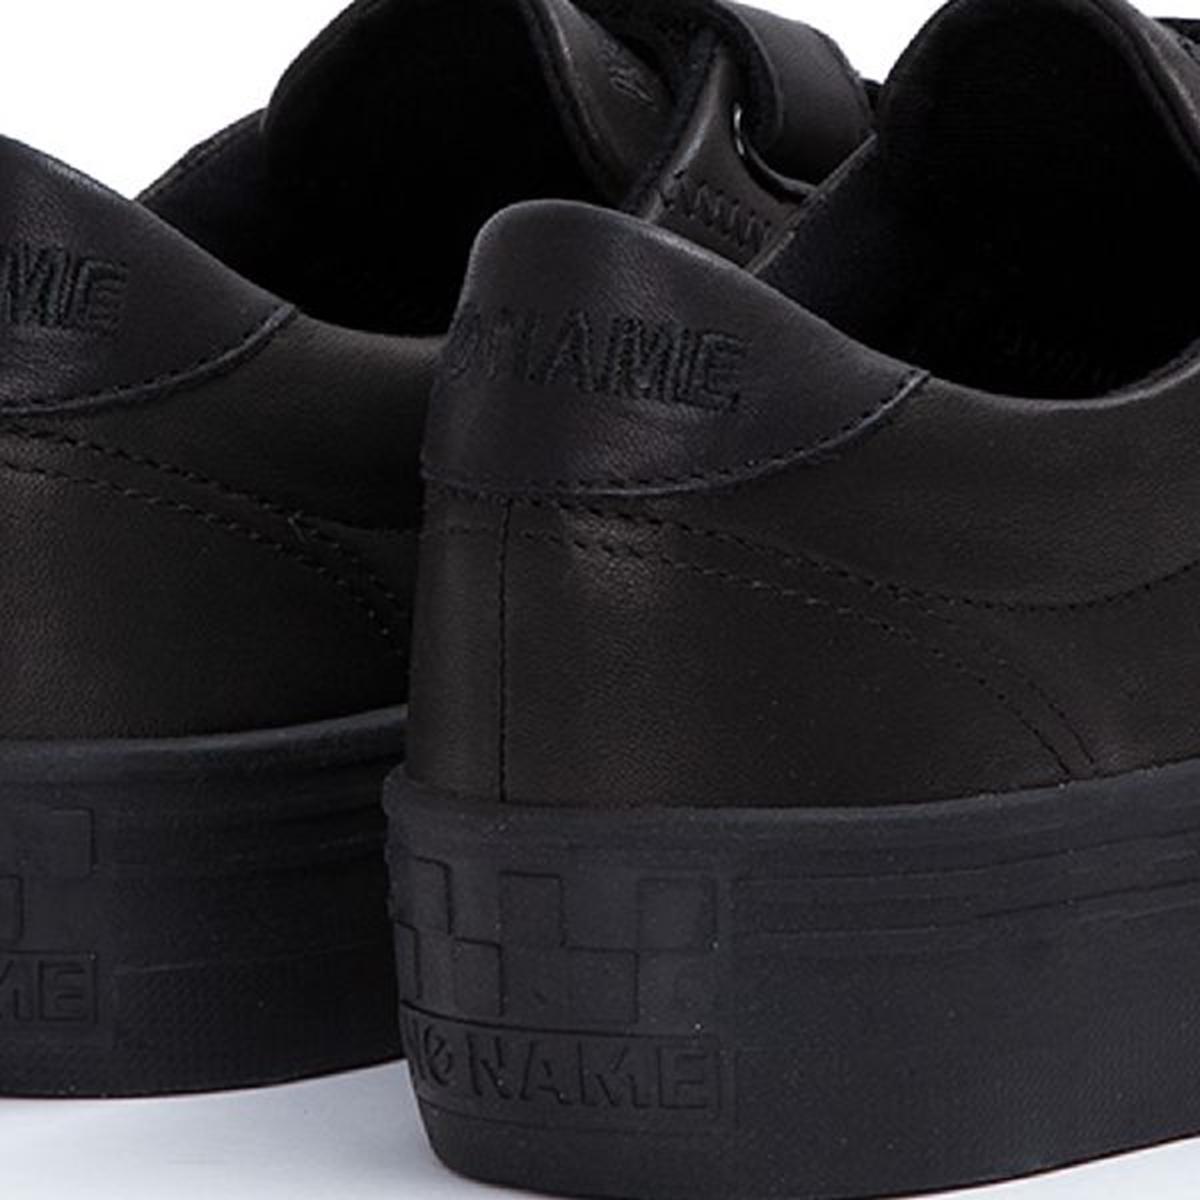 NO NAME ノーネーム PLATO-01250-BLACK プラト ブラック